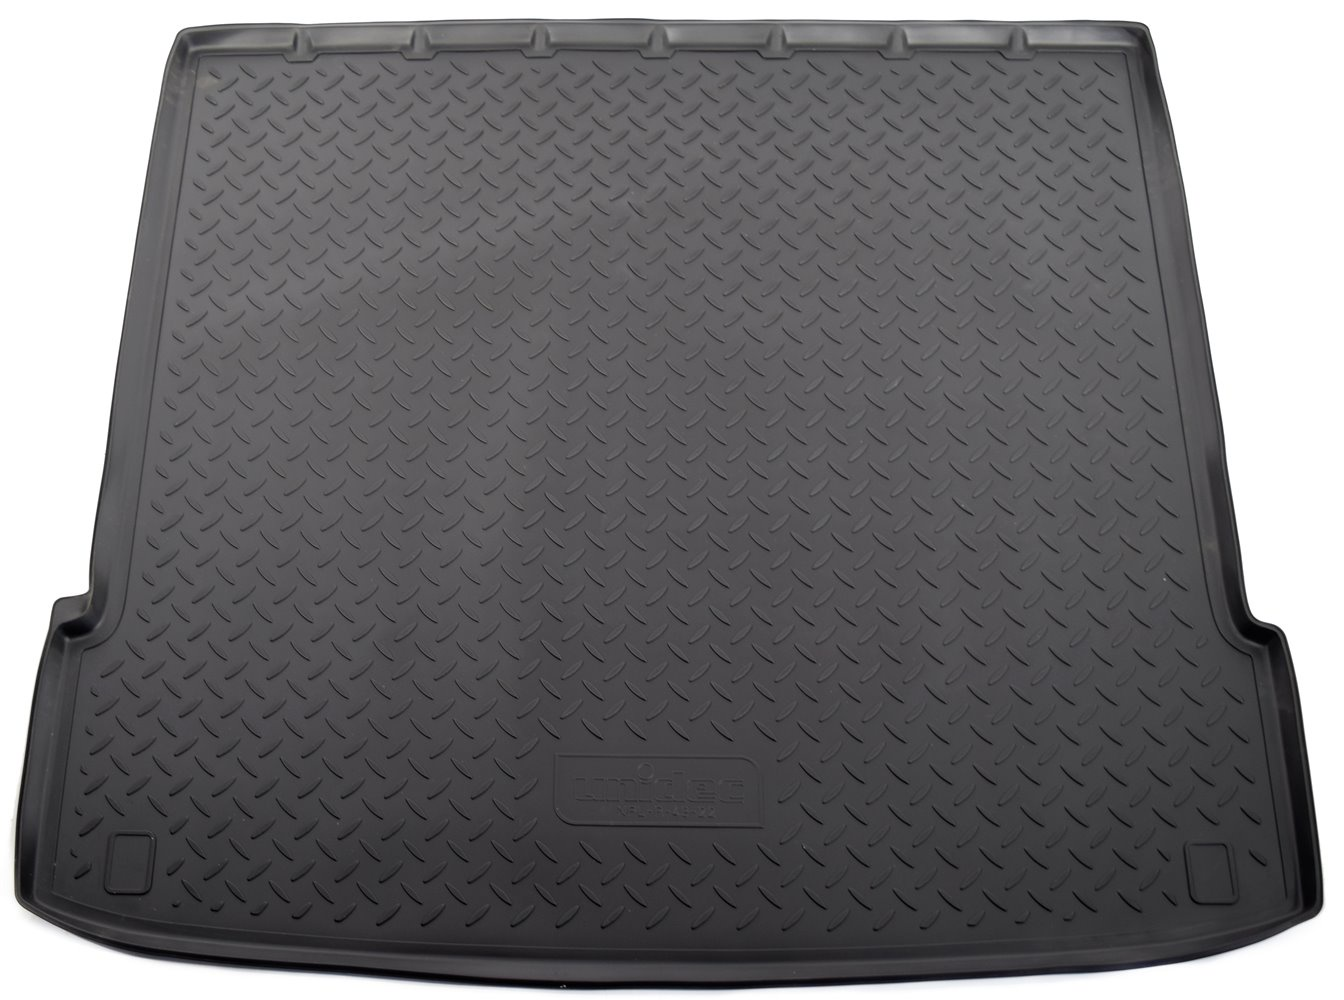 Коврик багажника Norplast для Kia Mohave EN 2008, NPL-P-43-22, черный